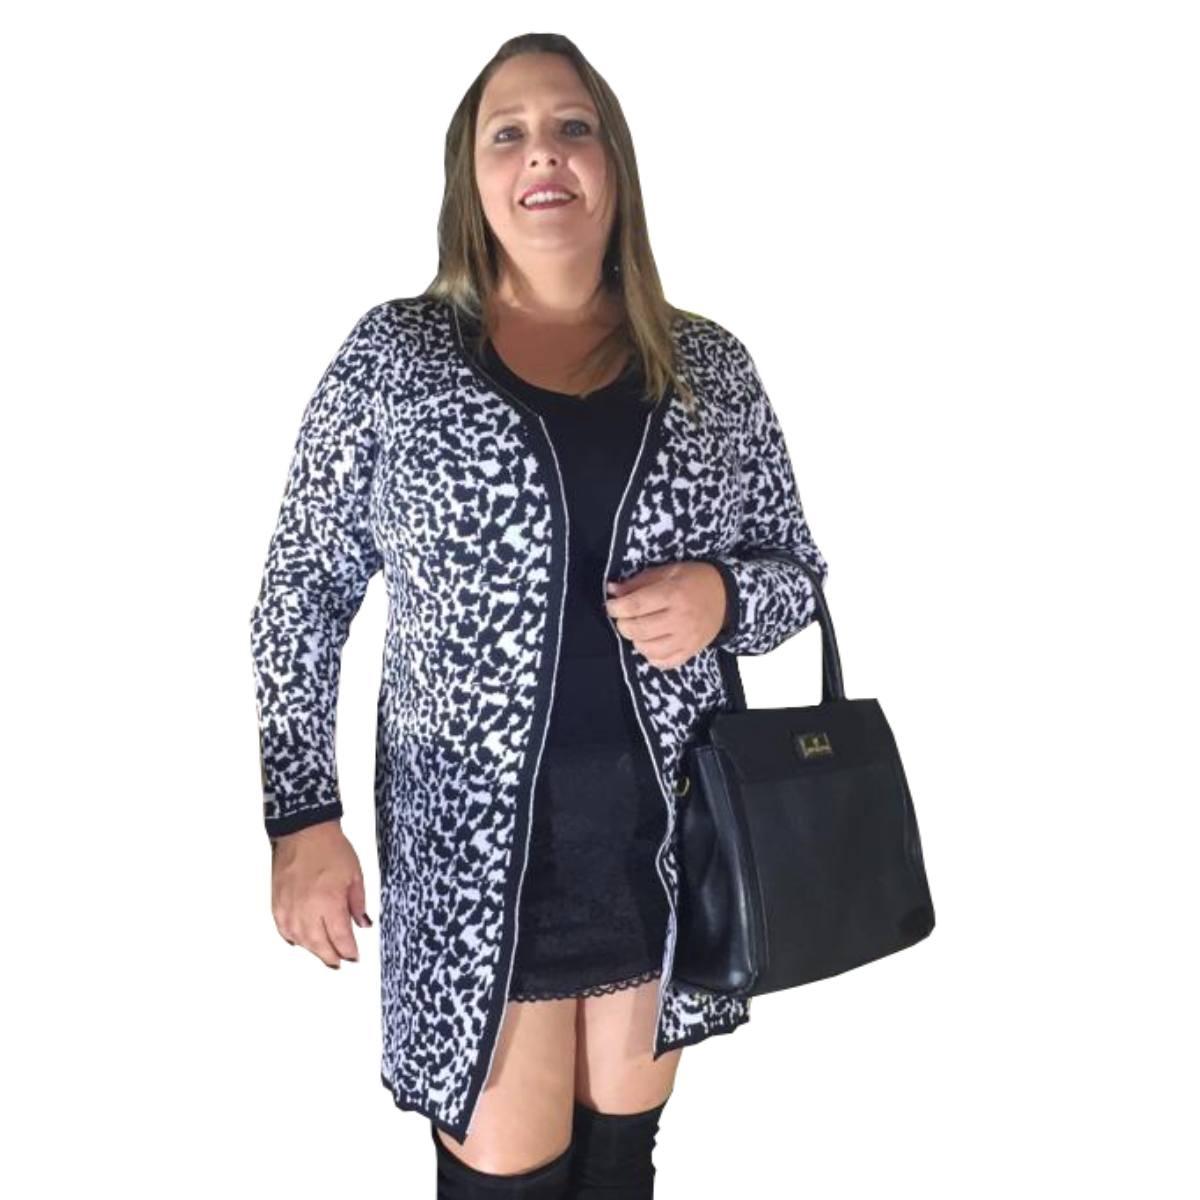 55f9b93ae casaco plus size de inverno moda feminina 2019